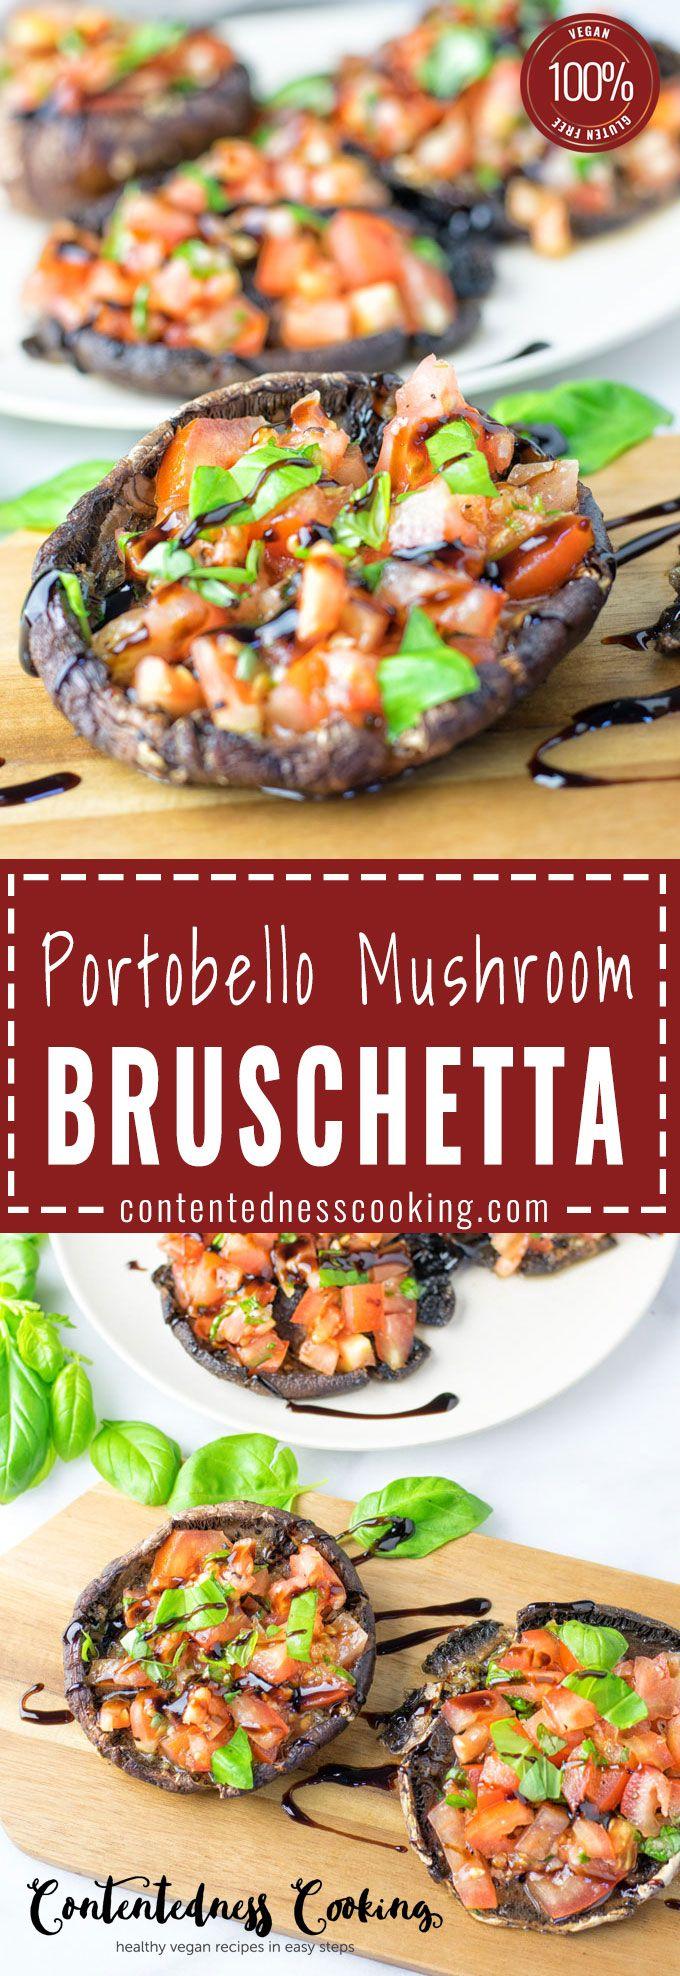 Portobello Mushroom Bruschetta a new and modern addiction of a classic. Makes the perfect appetizer, lunch or snack, vegan, gluten free, super delicious and impressive.